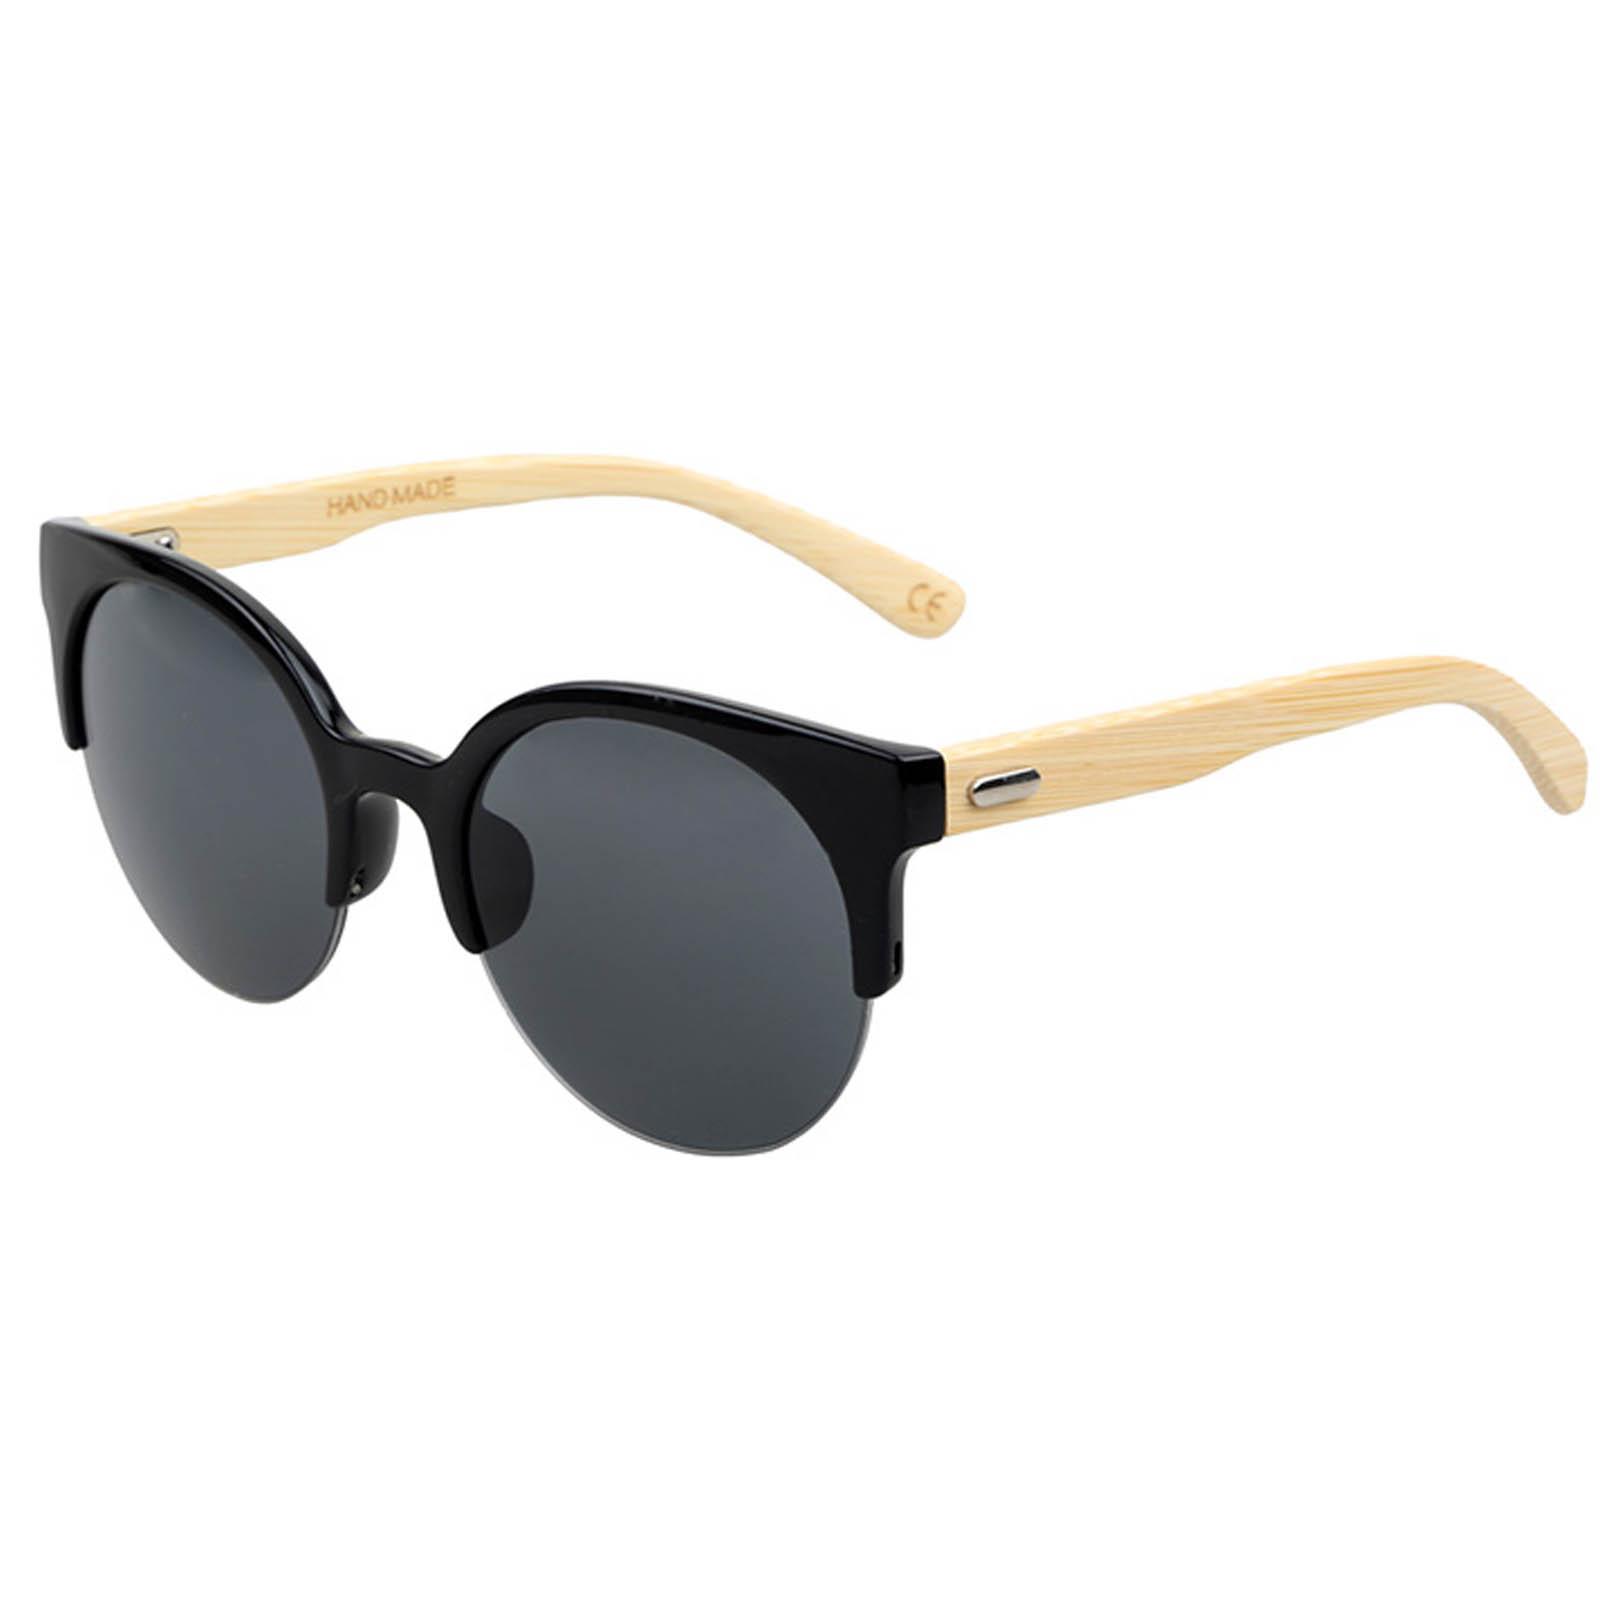 OWL ® 037 C1 Cat Eyewear Sunglasses Women\'s Men\'s Bamboo Black Frame ...